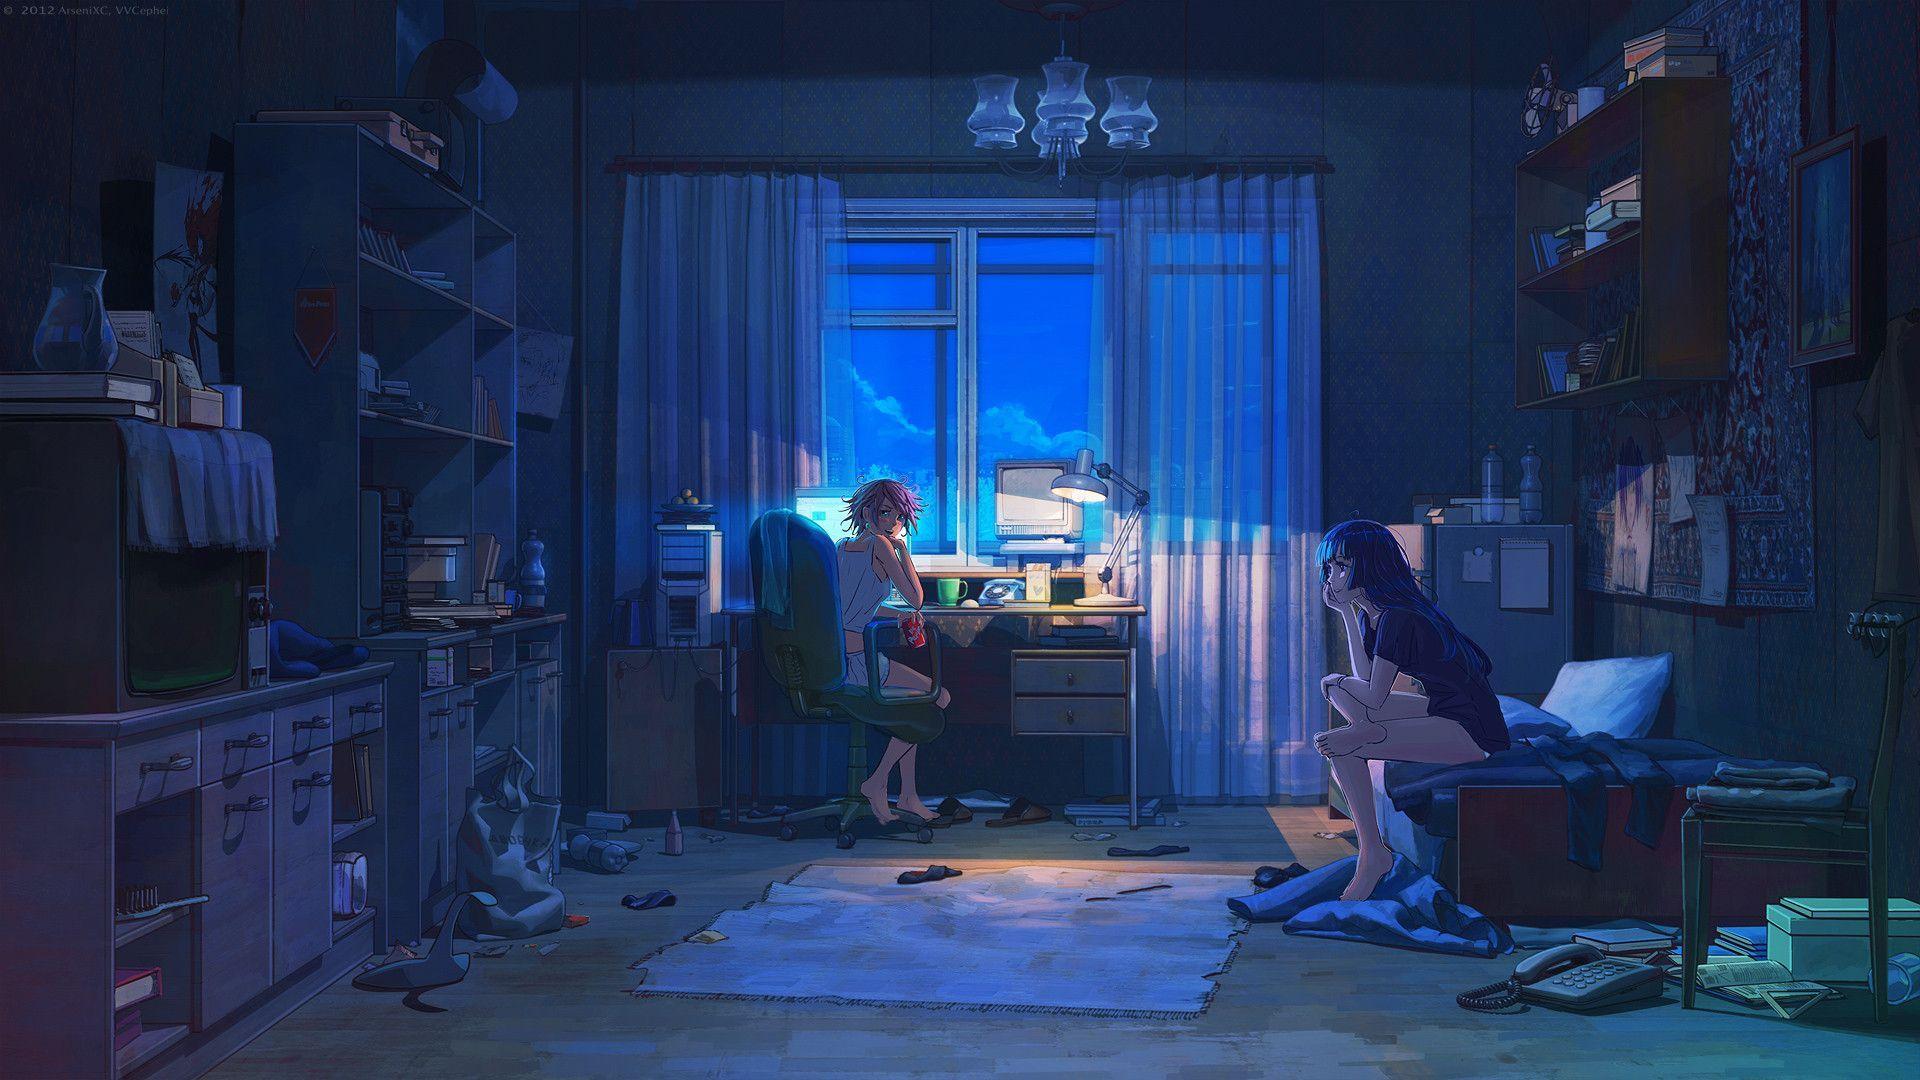 Lo Fi Anime Wallpapers   Top Lo Fi Anime Backgrounds 1920x1080